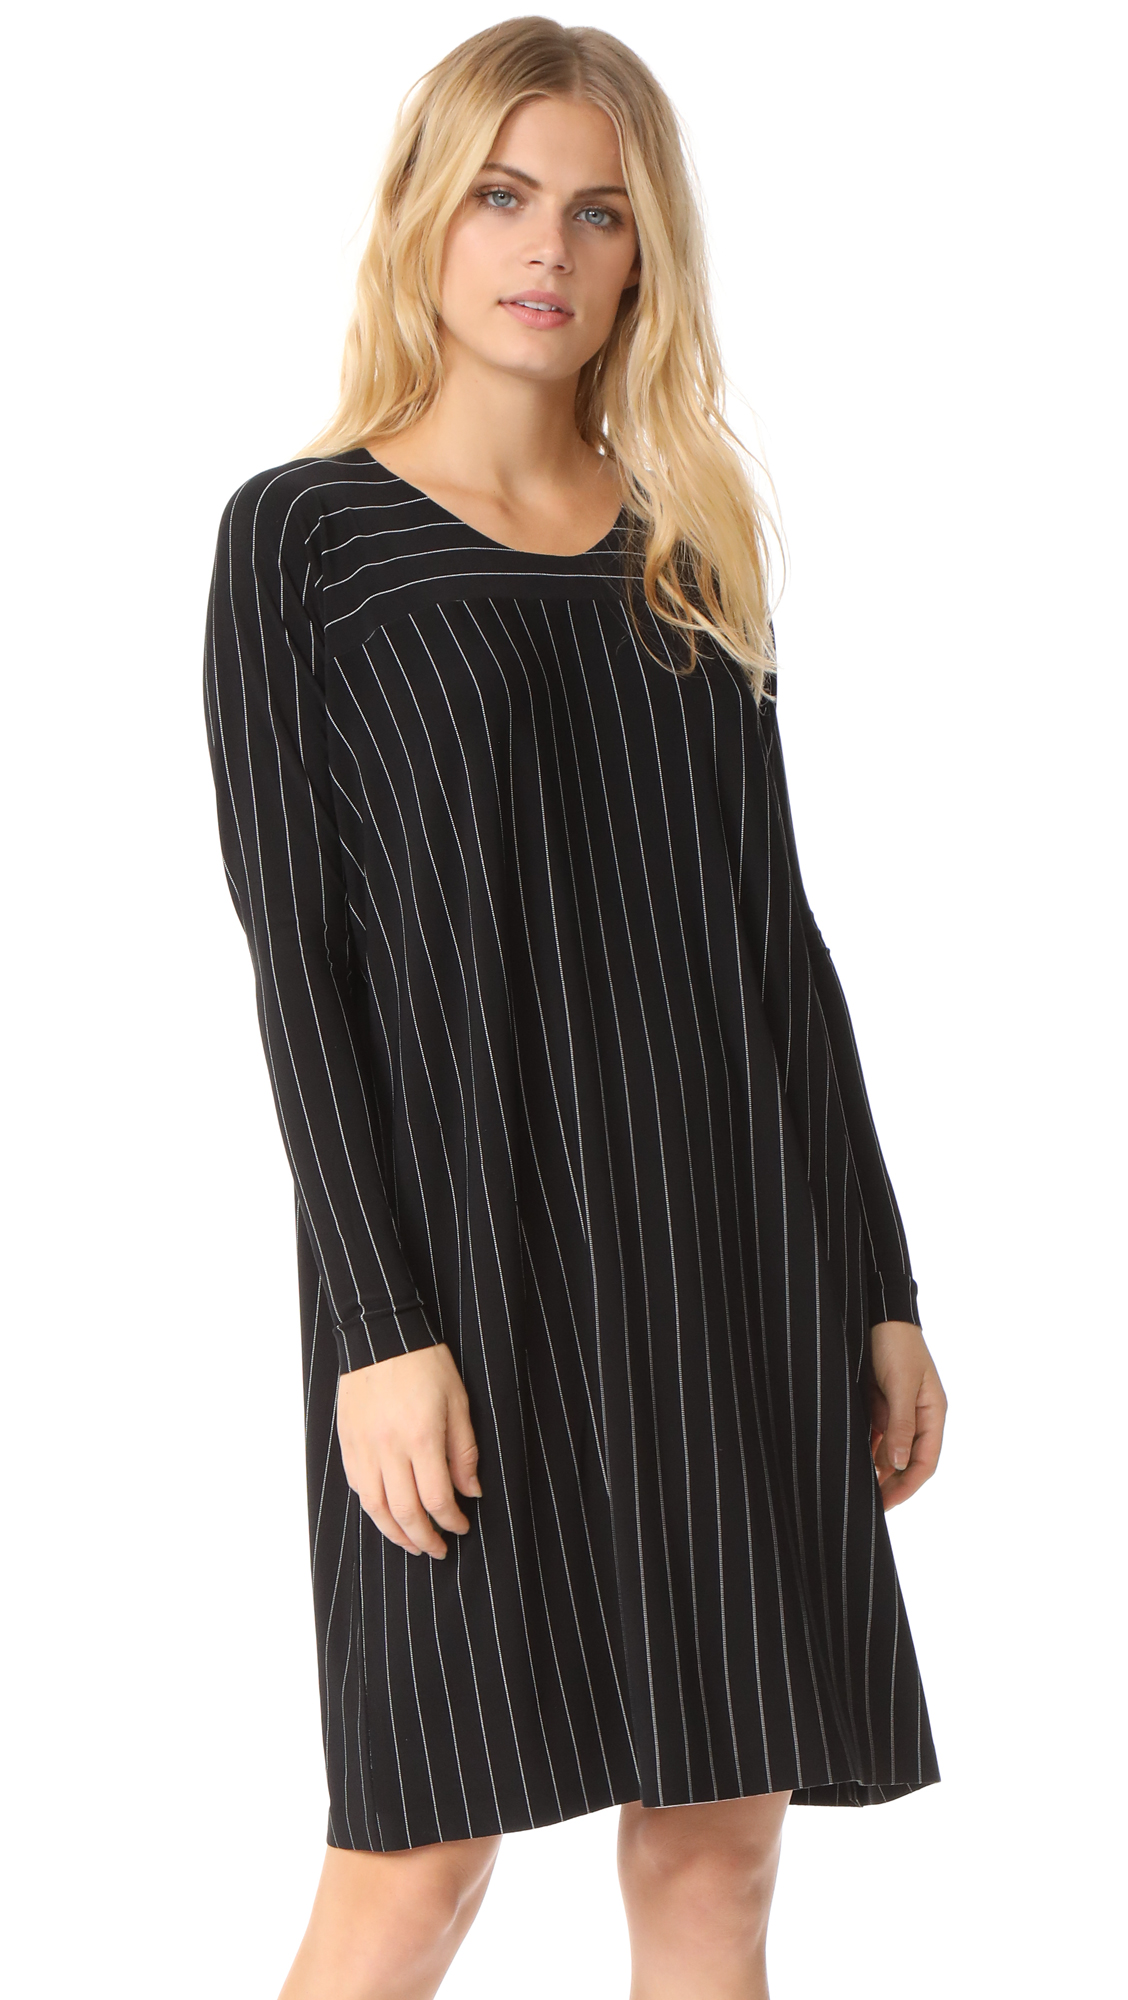 Norma Kamali Box Dress - Black Pinstripe